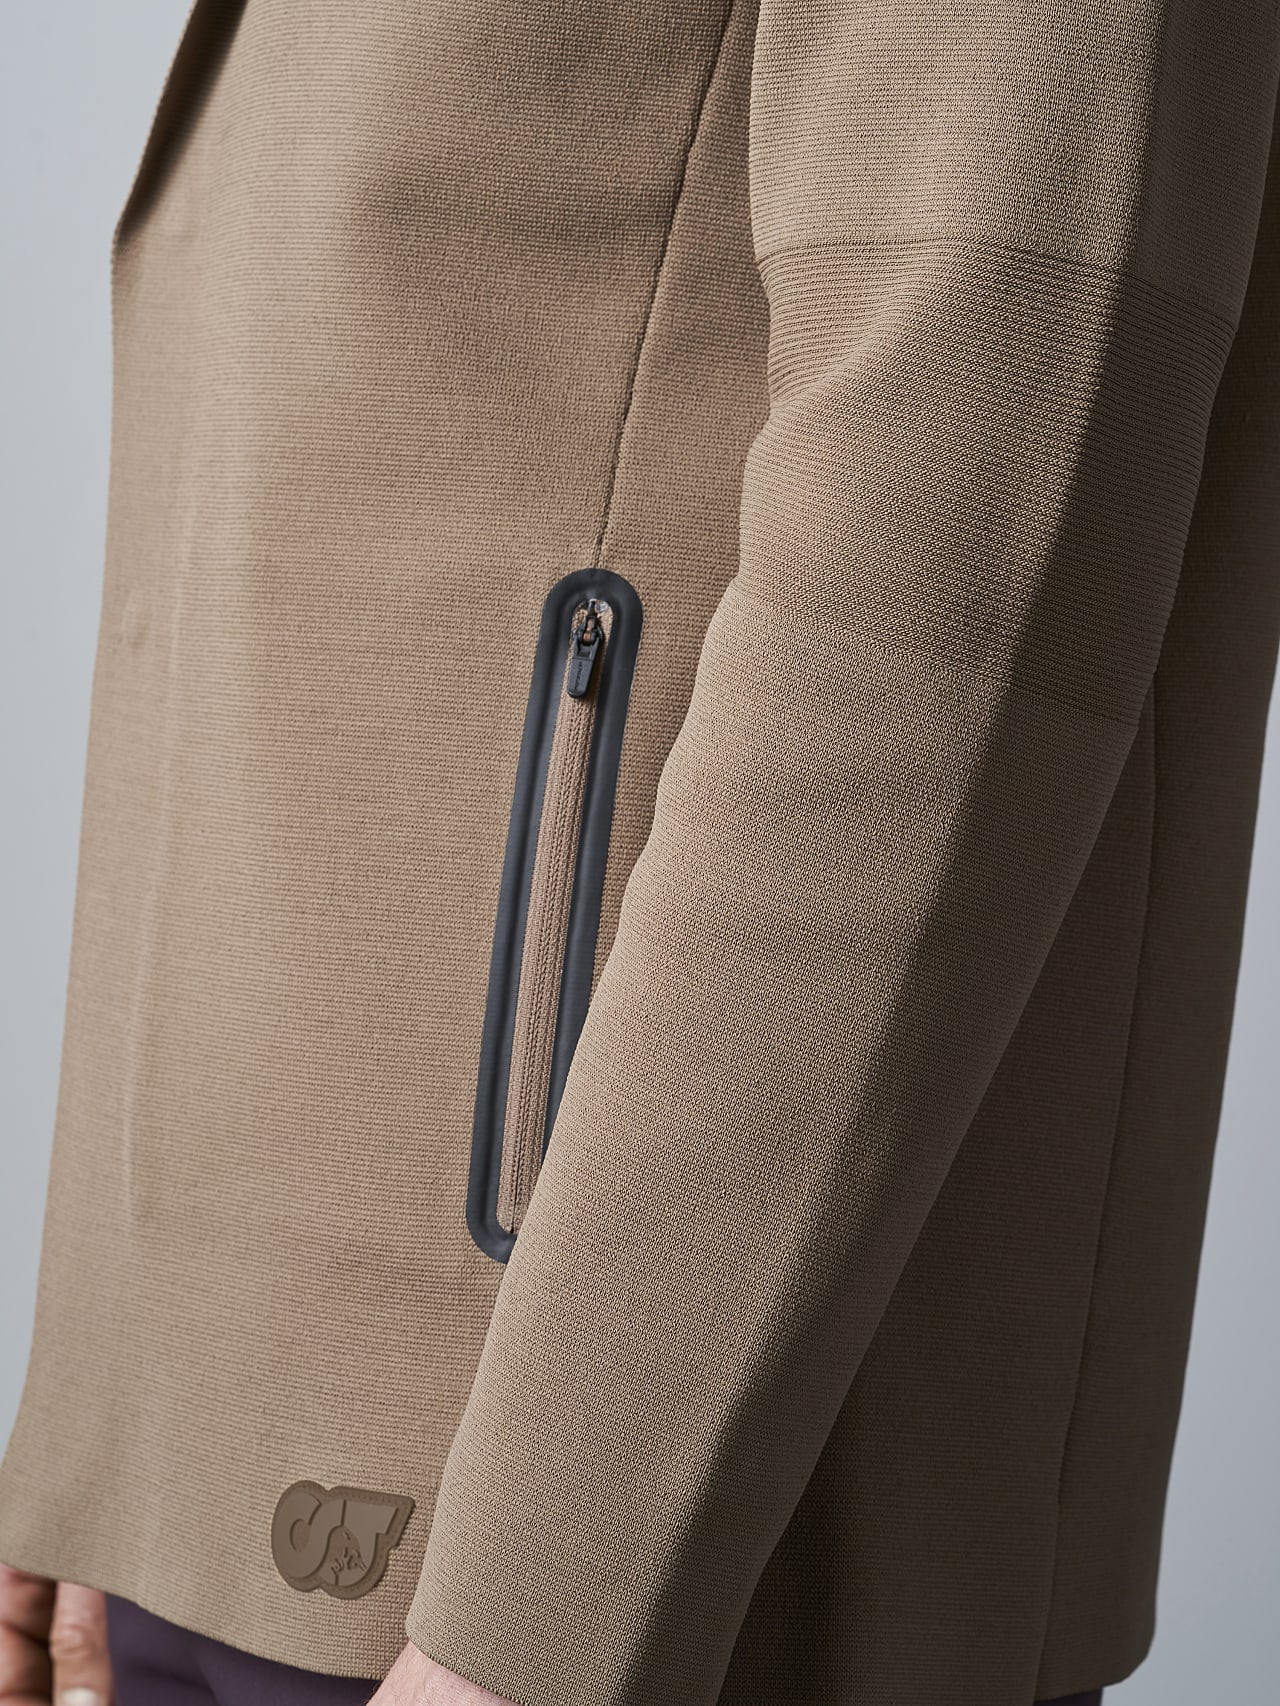 FELIP V1.Y5.02 Water-Repellent Knit Blazer gold scene7.view.9.name Alpha Tauri